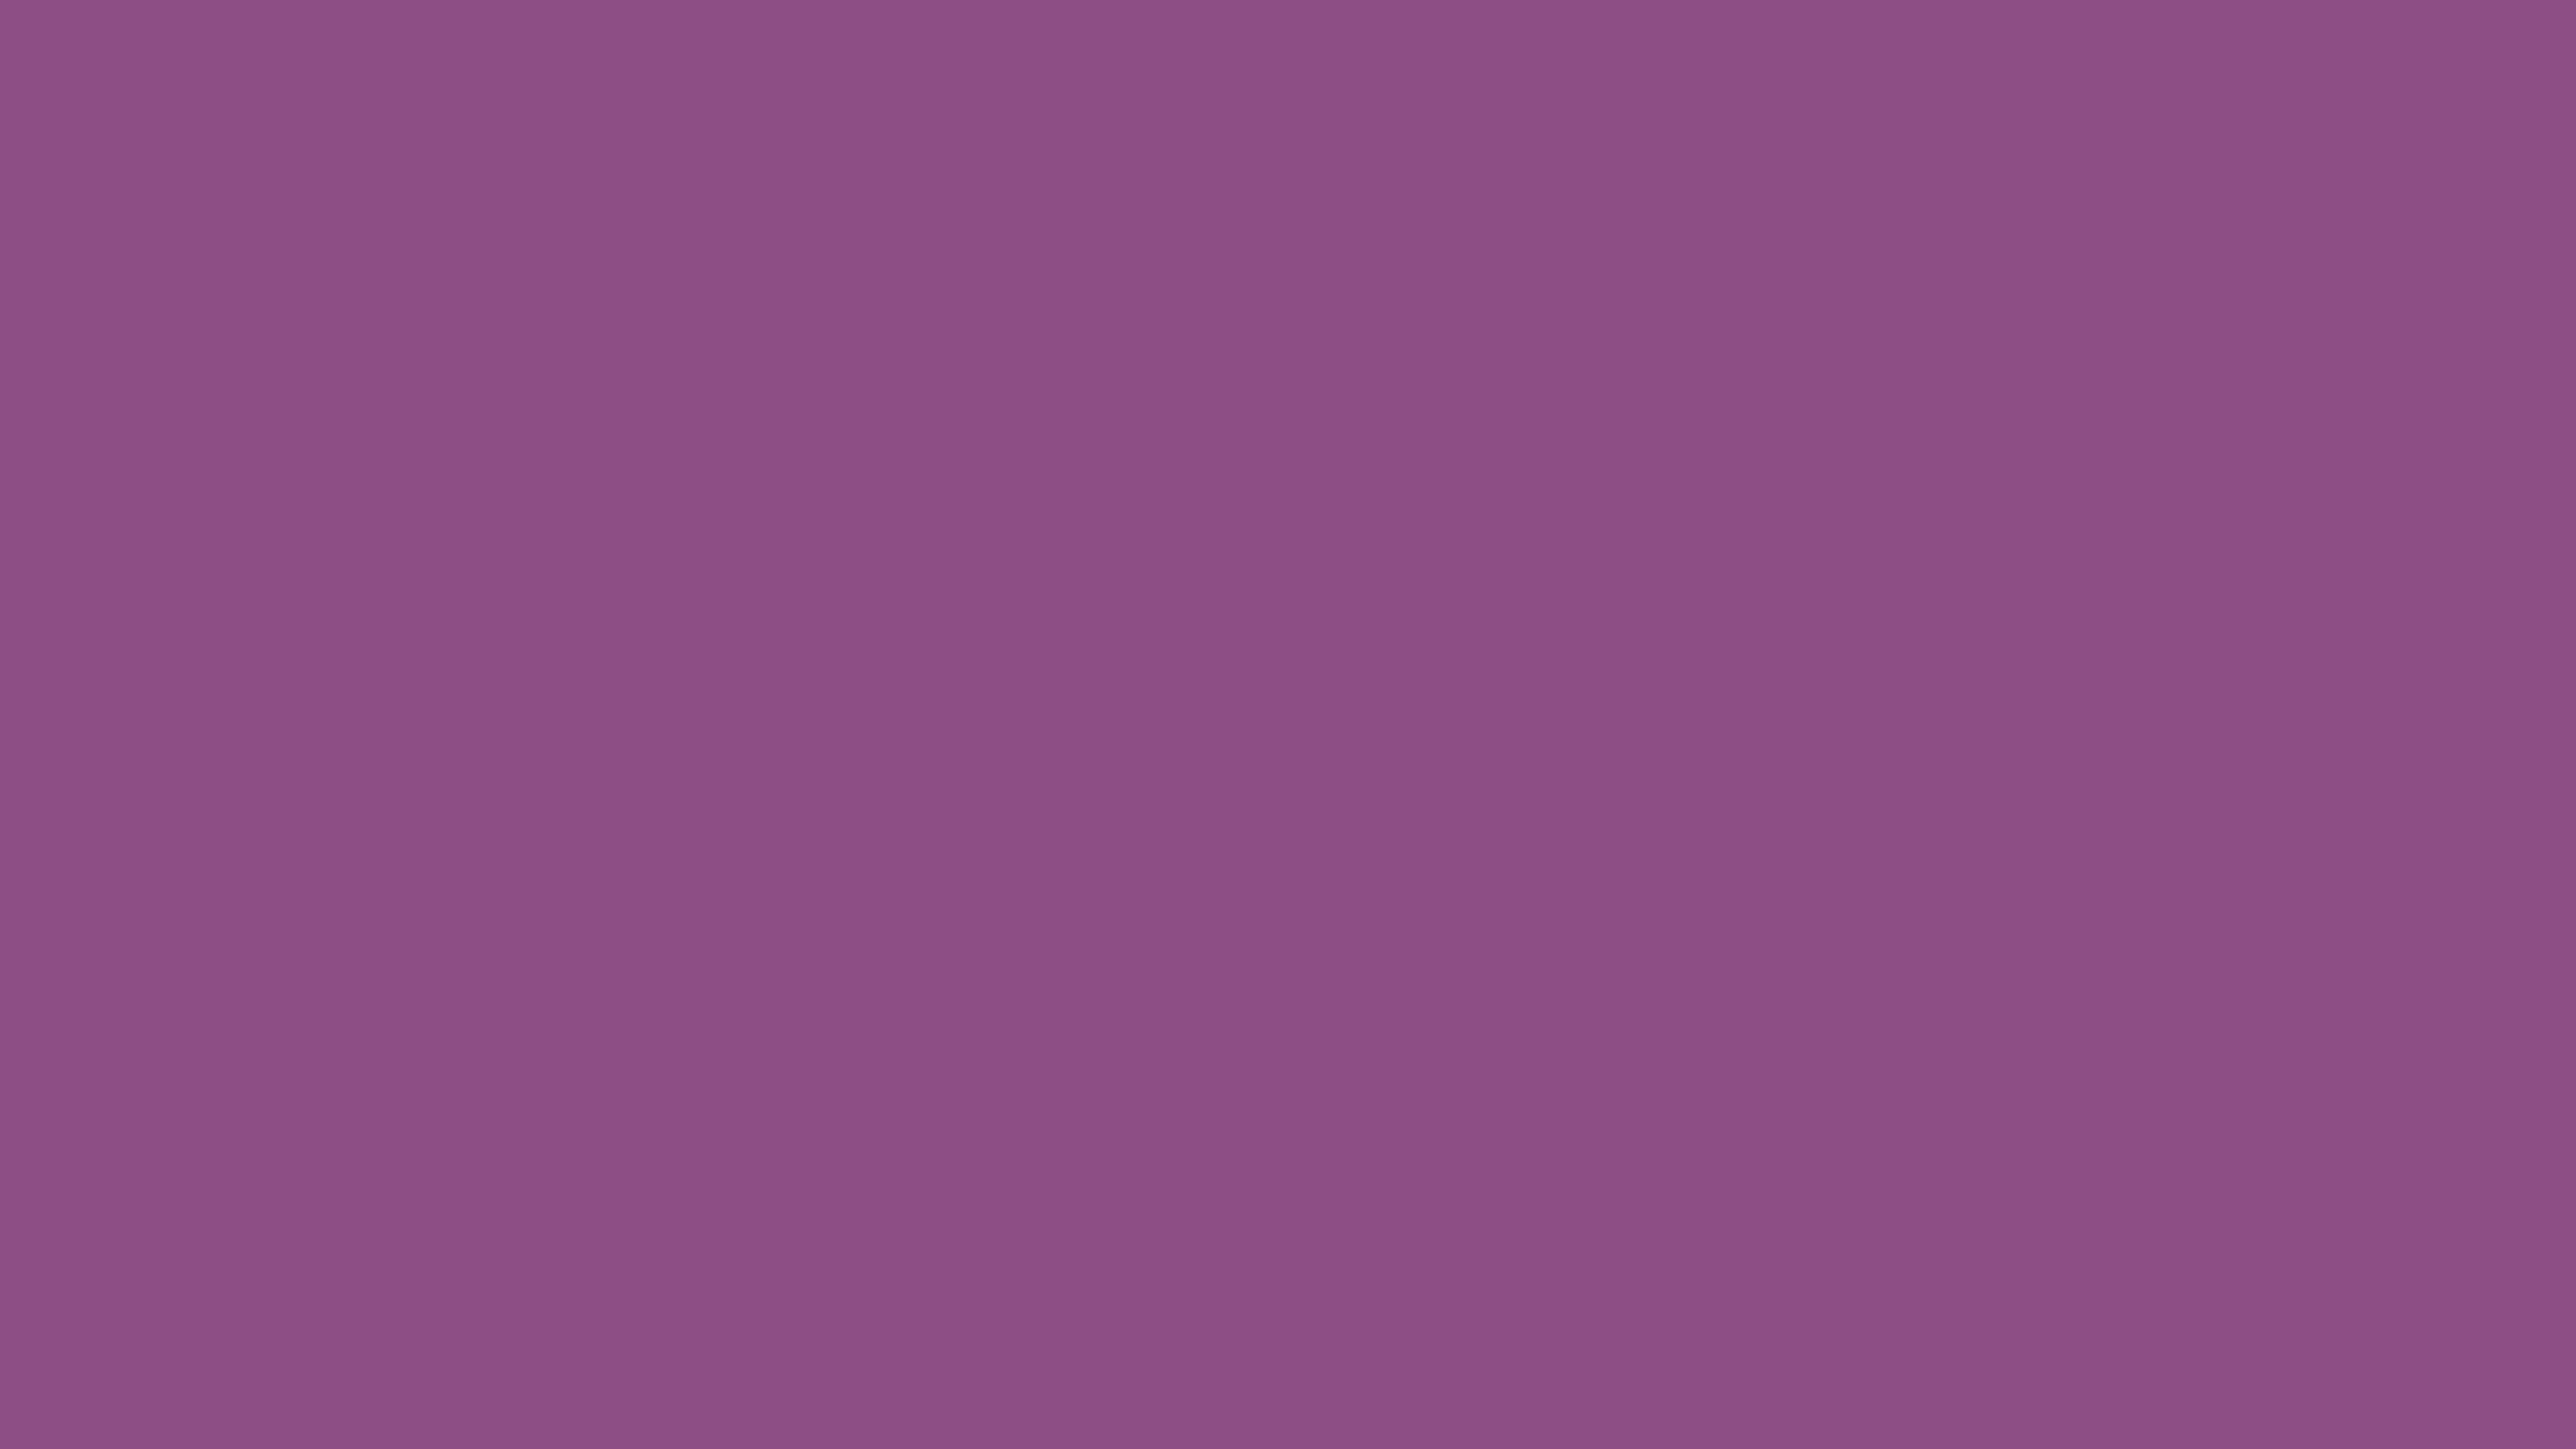 3840x2160 Razzmic Berry Solid Color Background